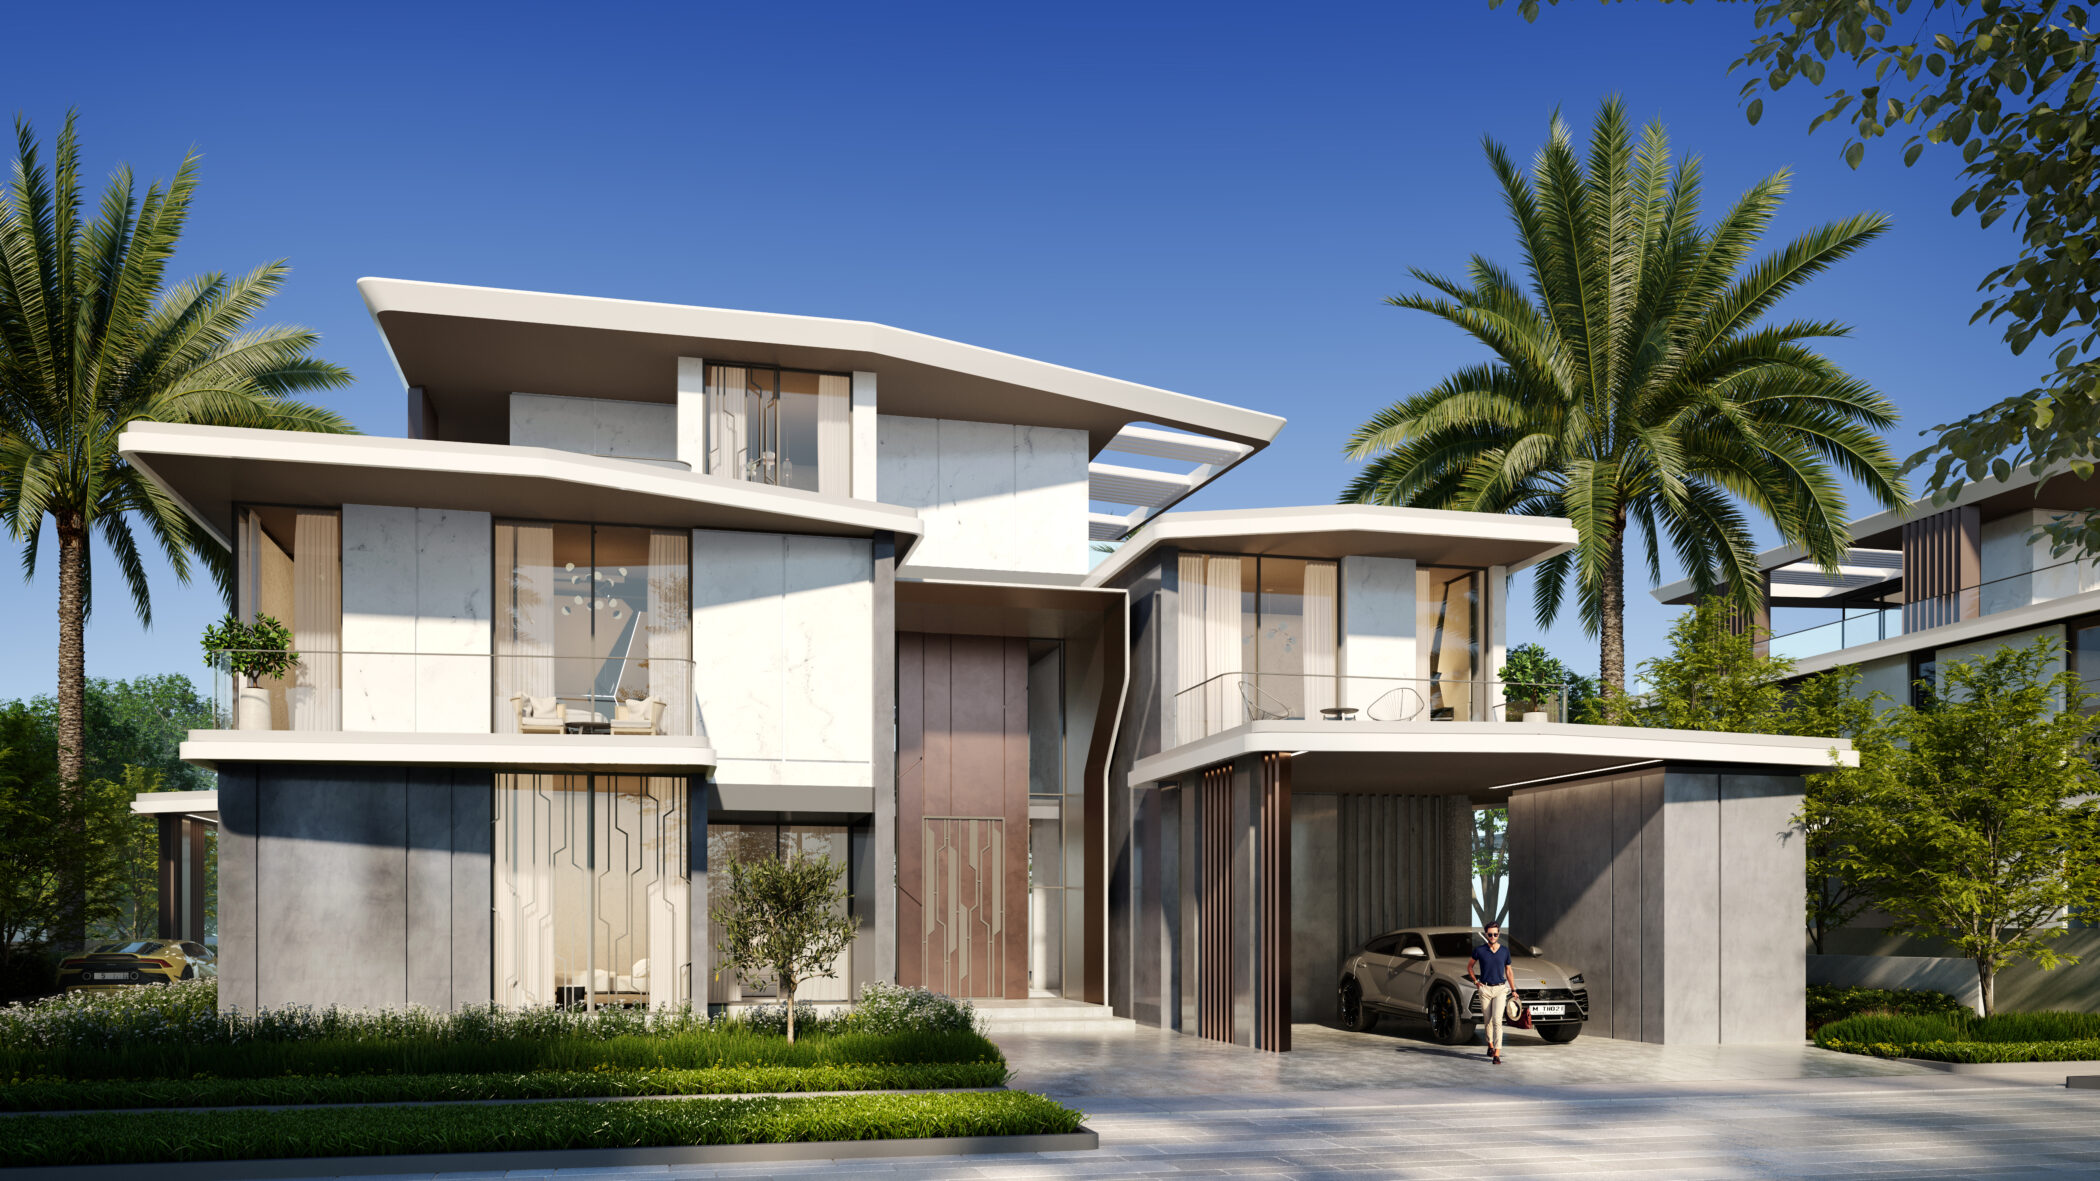 Dubai Hills Vista Inspired by Automobili Lamborghini in Dubai Hills Estate by Emaar. Wide selection of 6 bedroom villas for sale in Dubai 3 1